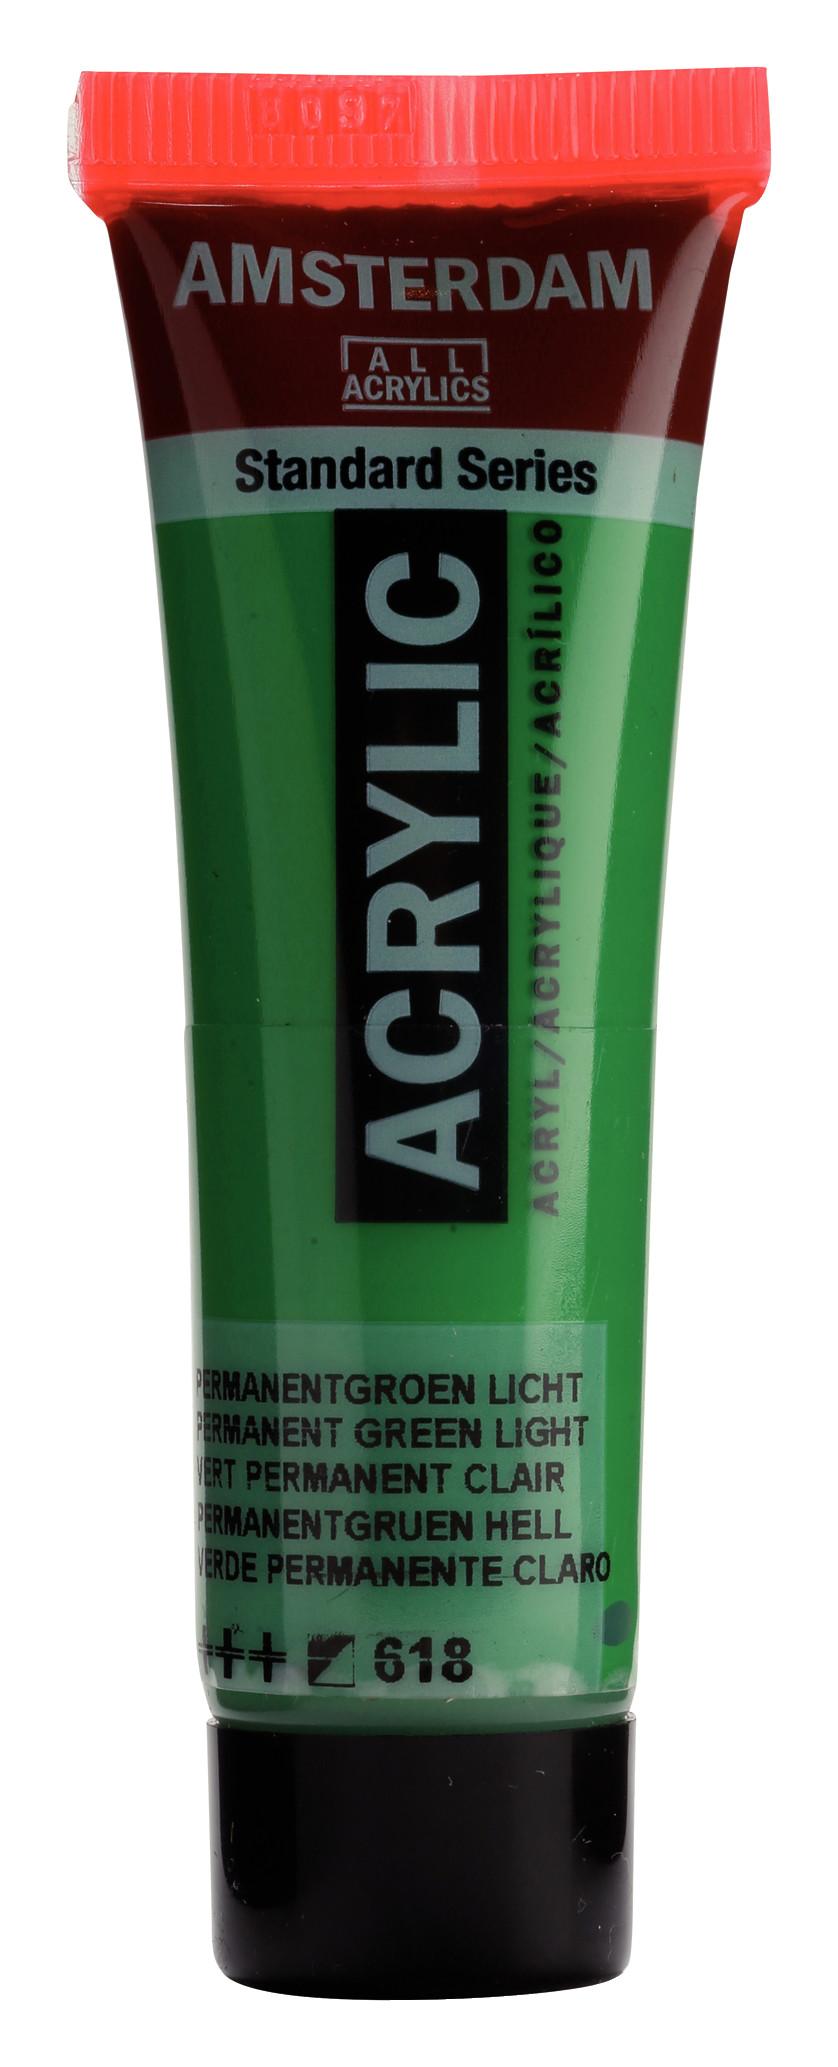 Amsterdam Standard Series Acrylic Tube 20 ml Permanent green light 618